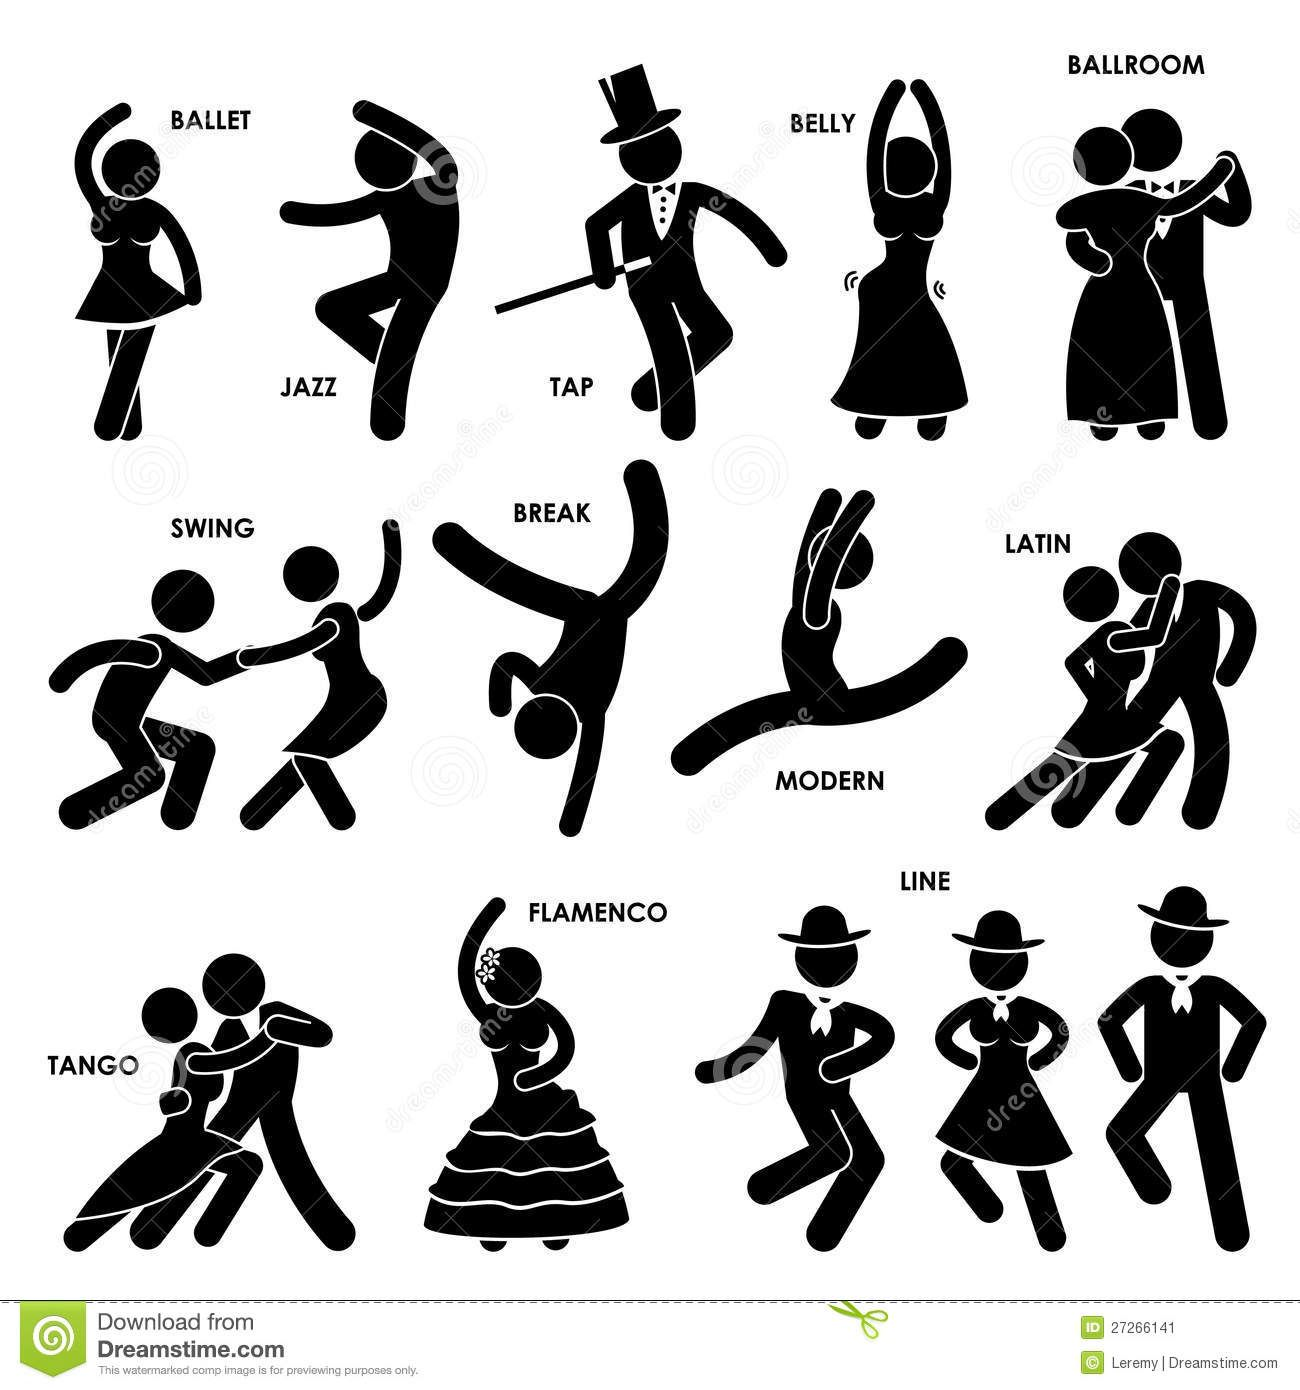 Dancing Dancer Pictogram Download From Over 54 Million